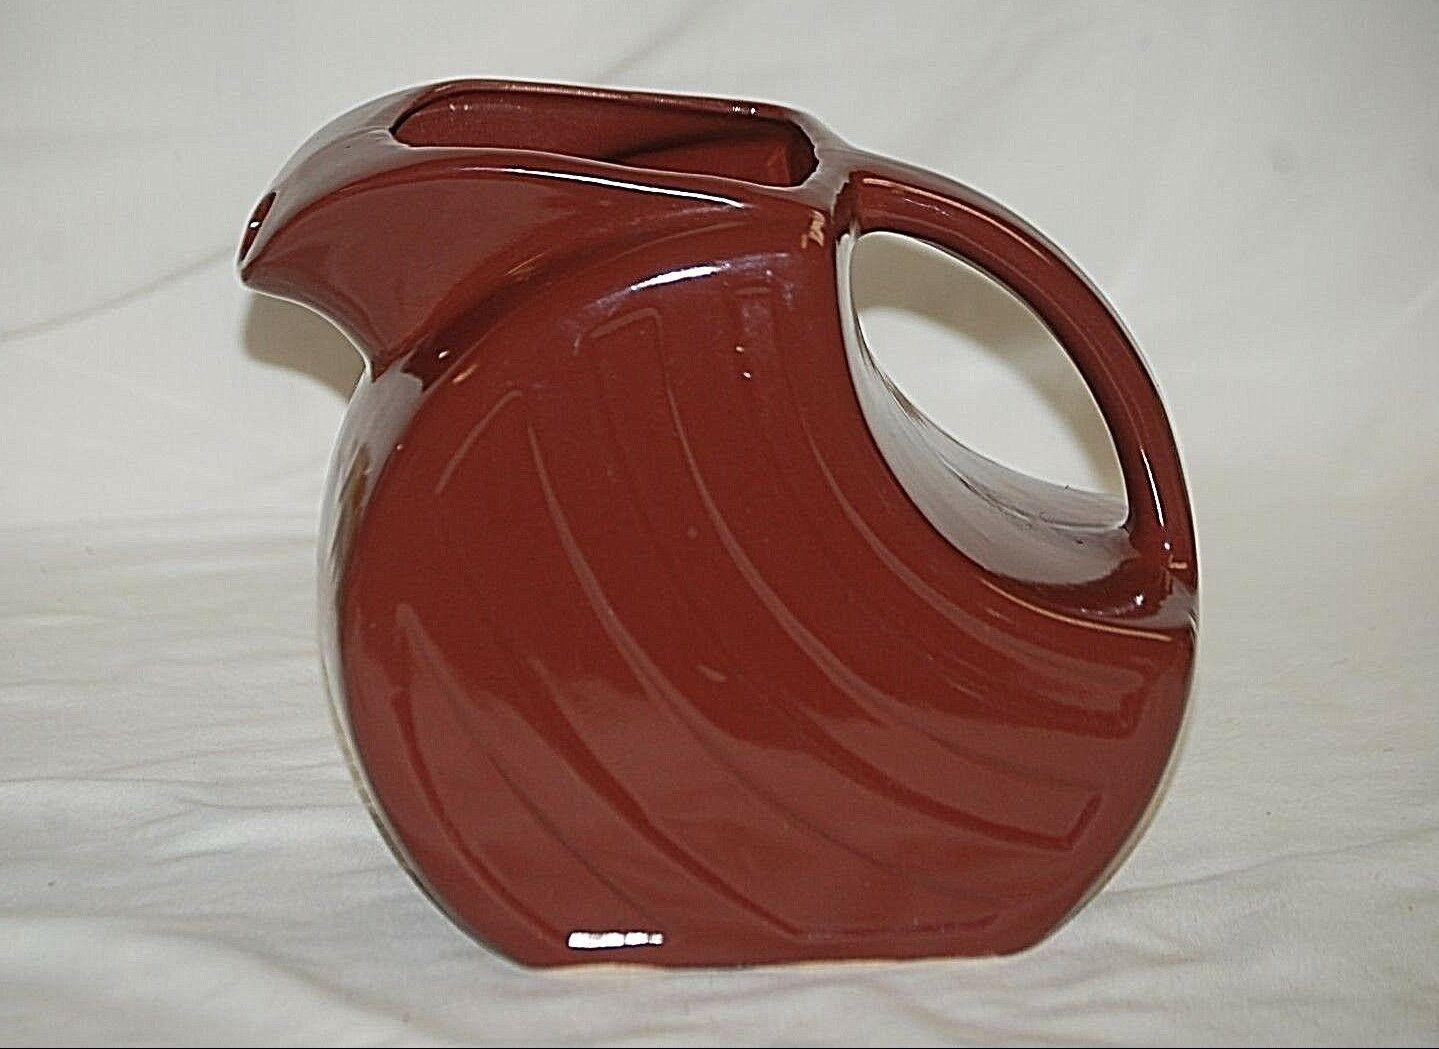 Old Vintage Retro Brown Ceramic Ice Box Refrigerator Pitcher Unknown Maker - $39.59